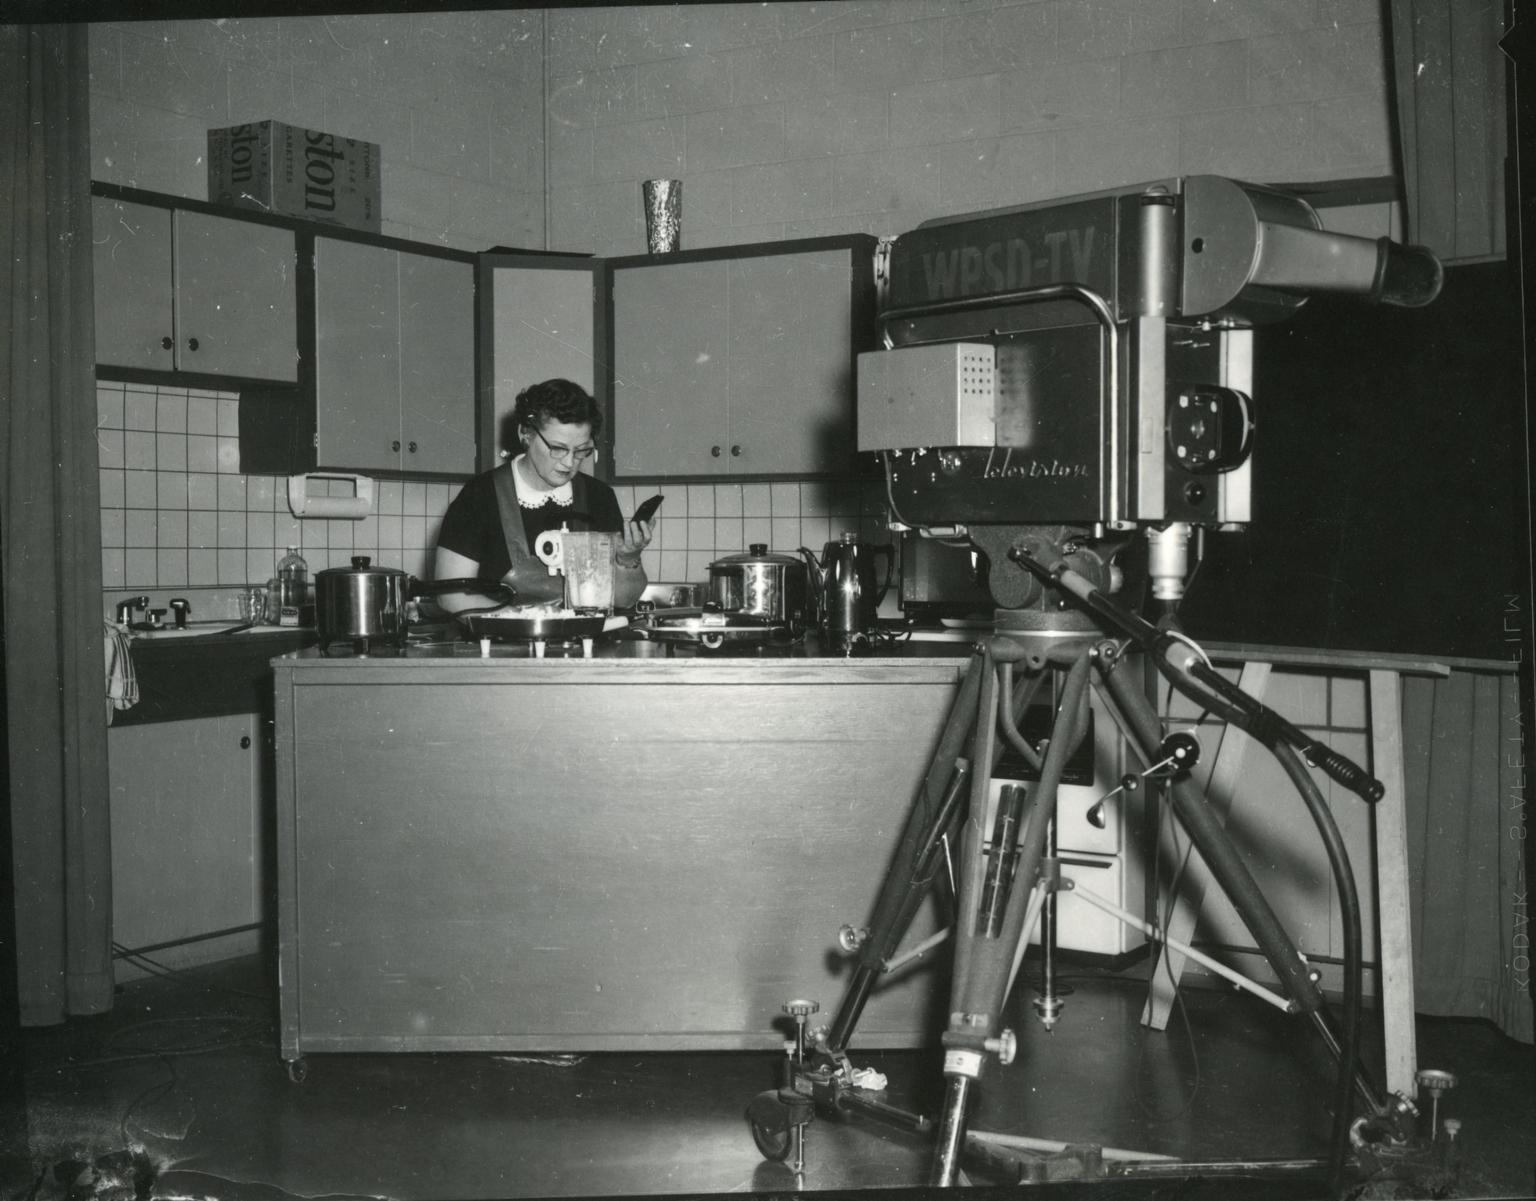 WPSD studio and kitchen set